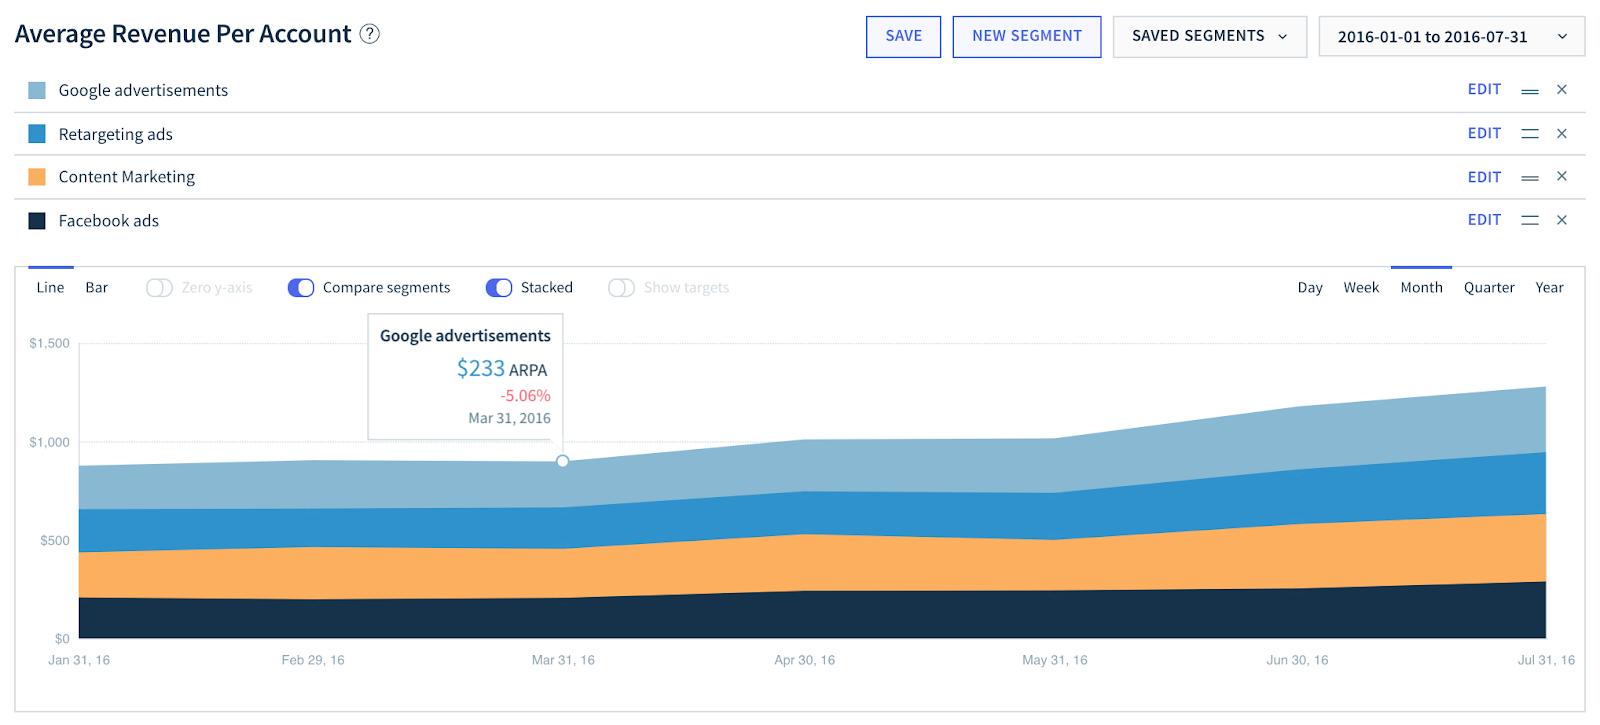 ARPU segmented by marketing channel inside ChartMogul